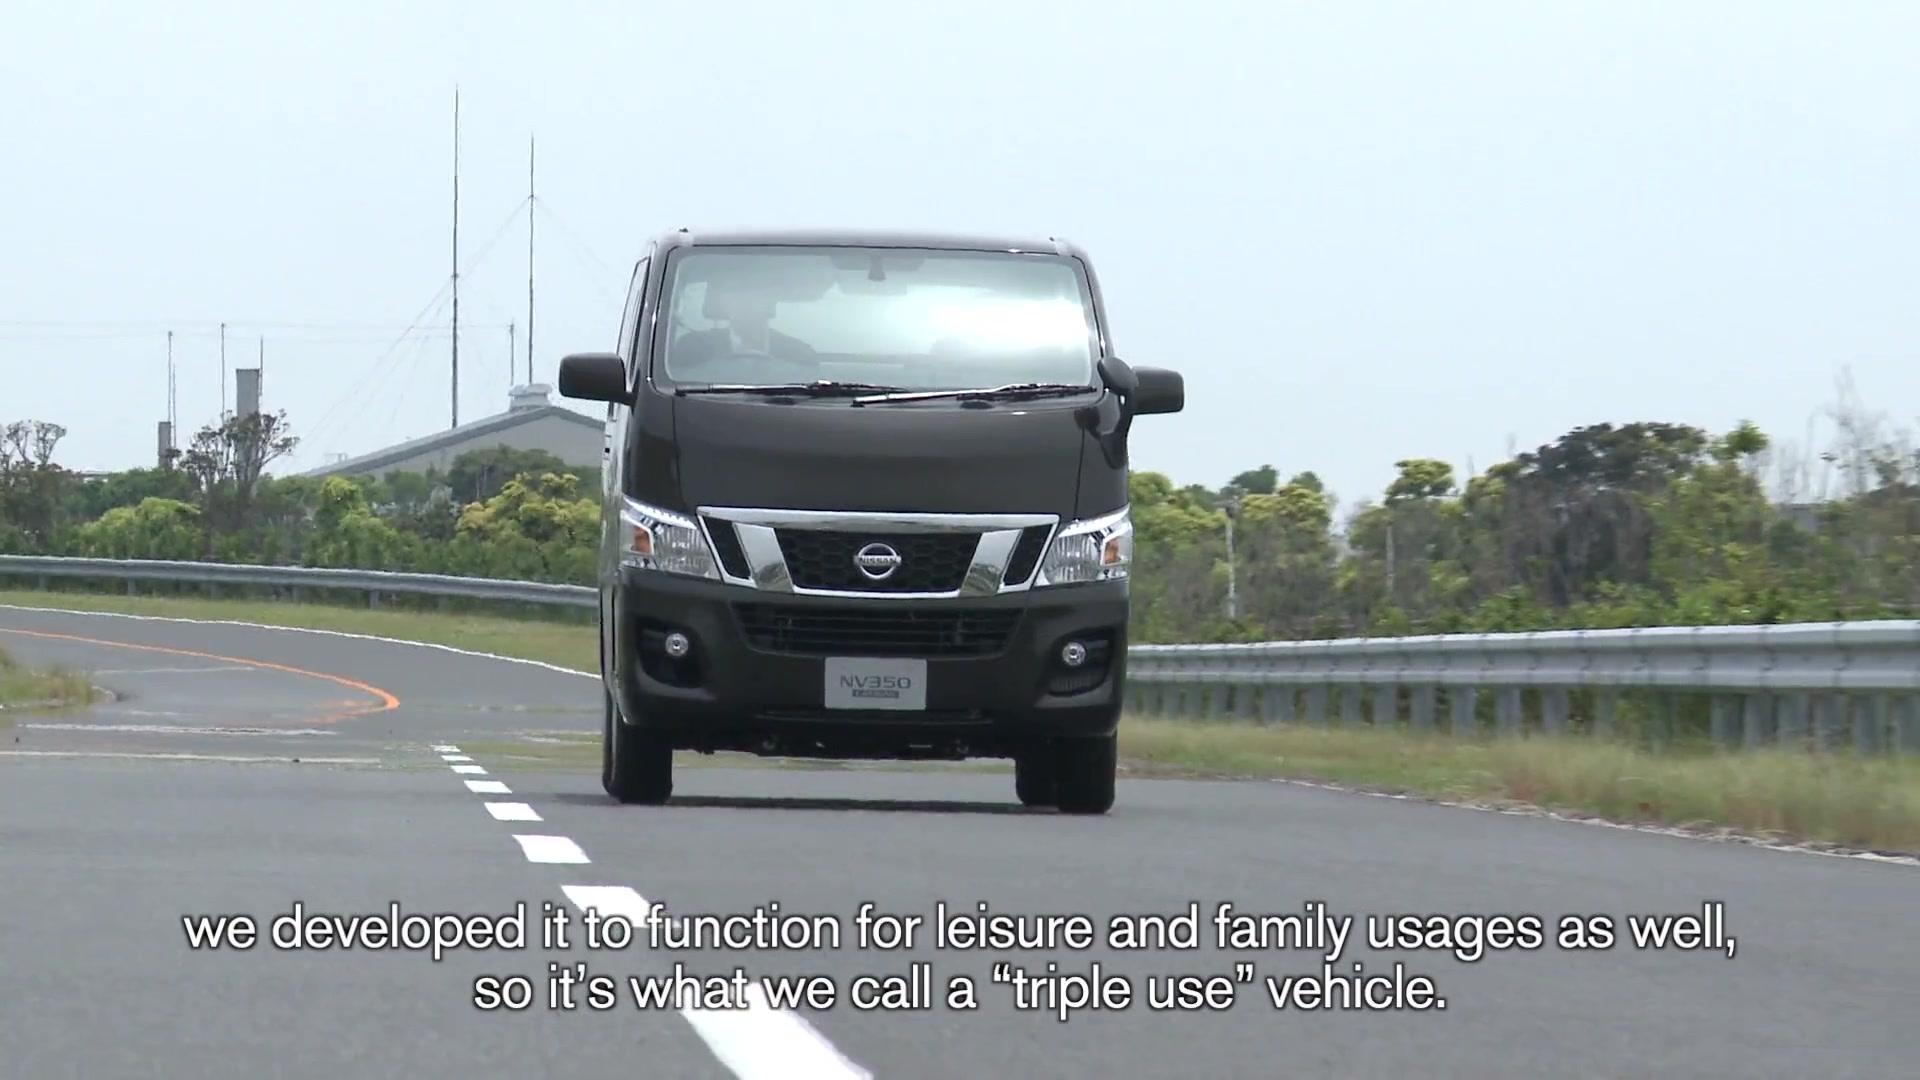 NV350 Chief's Lowdown on Nissan's Newest Van